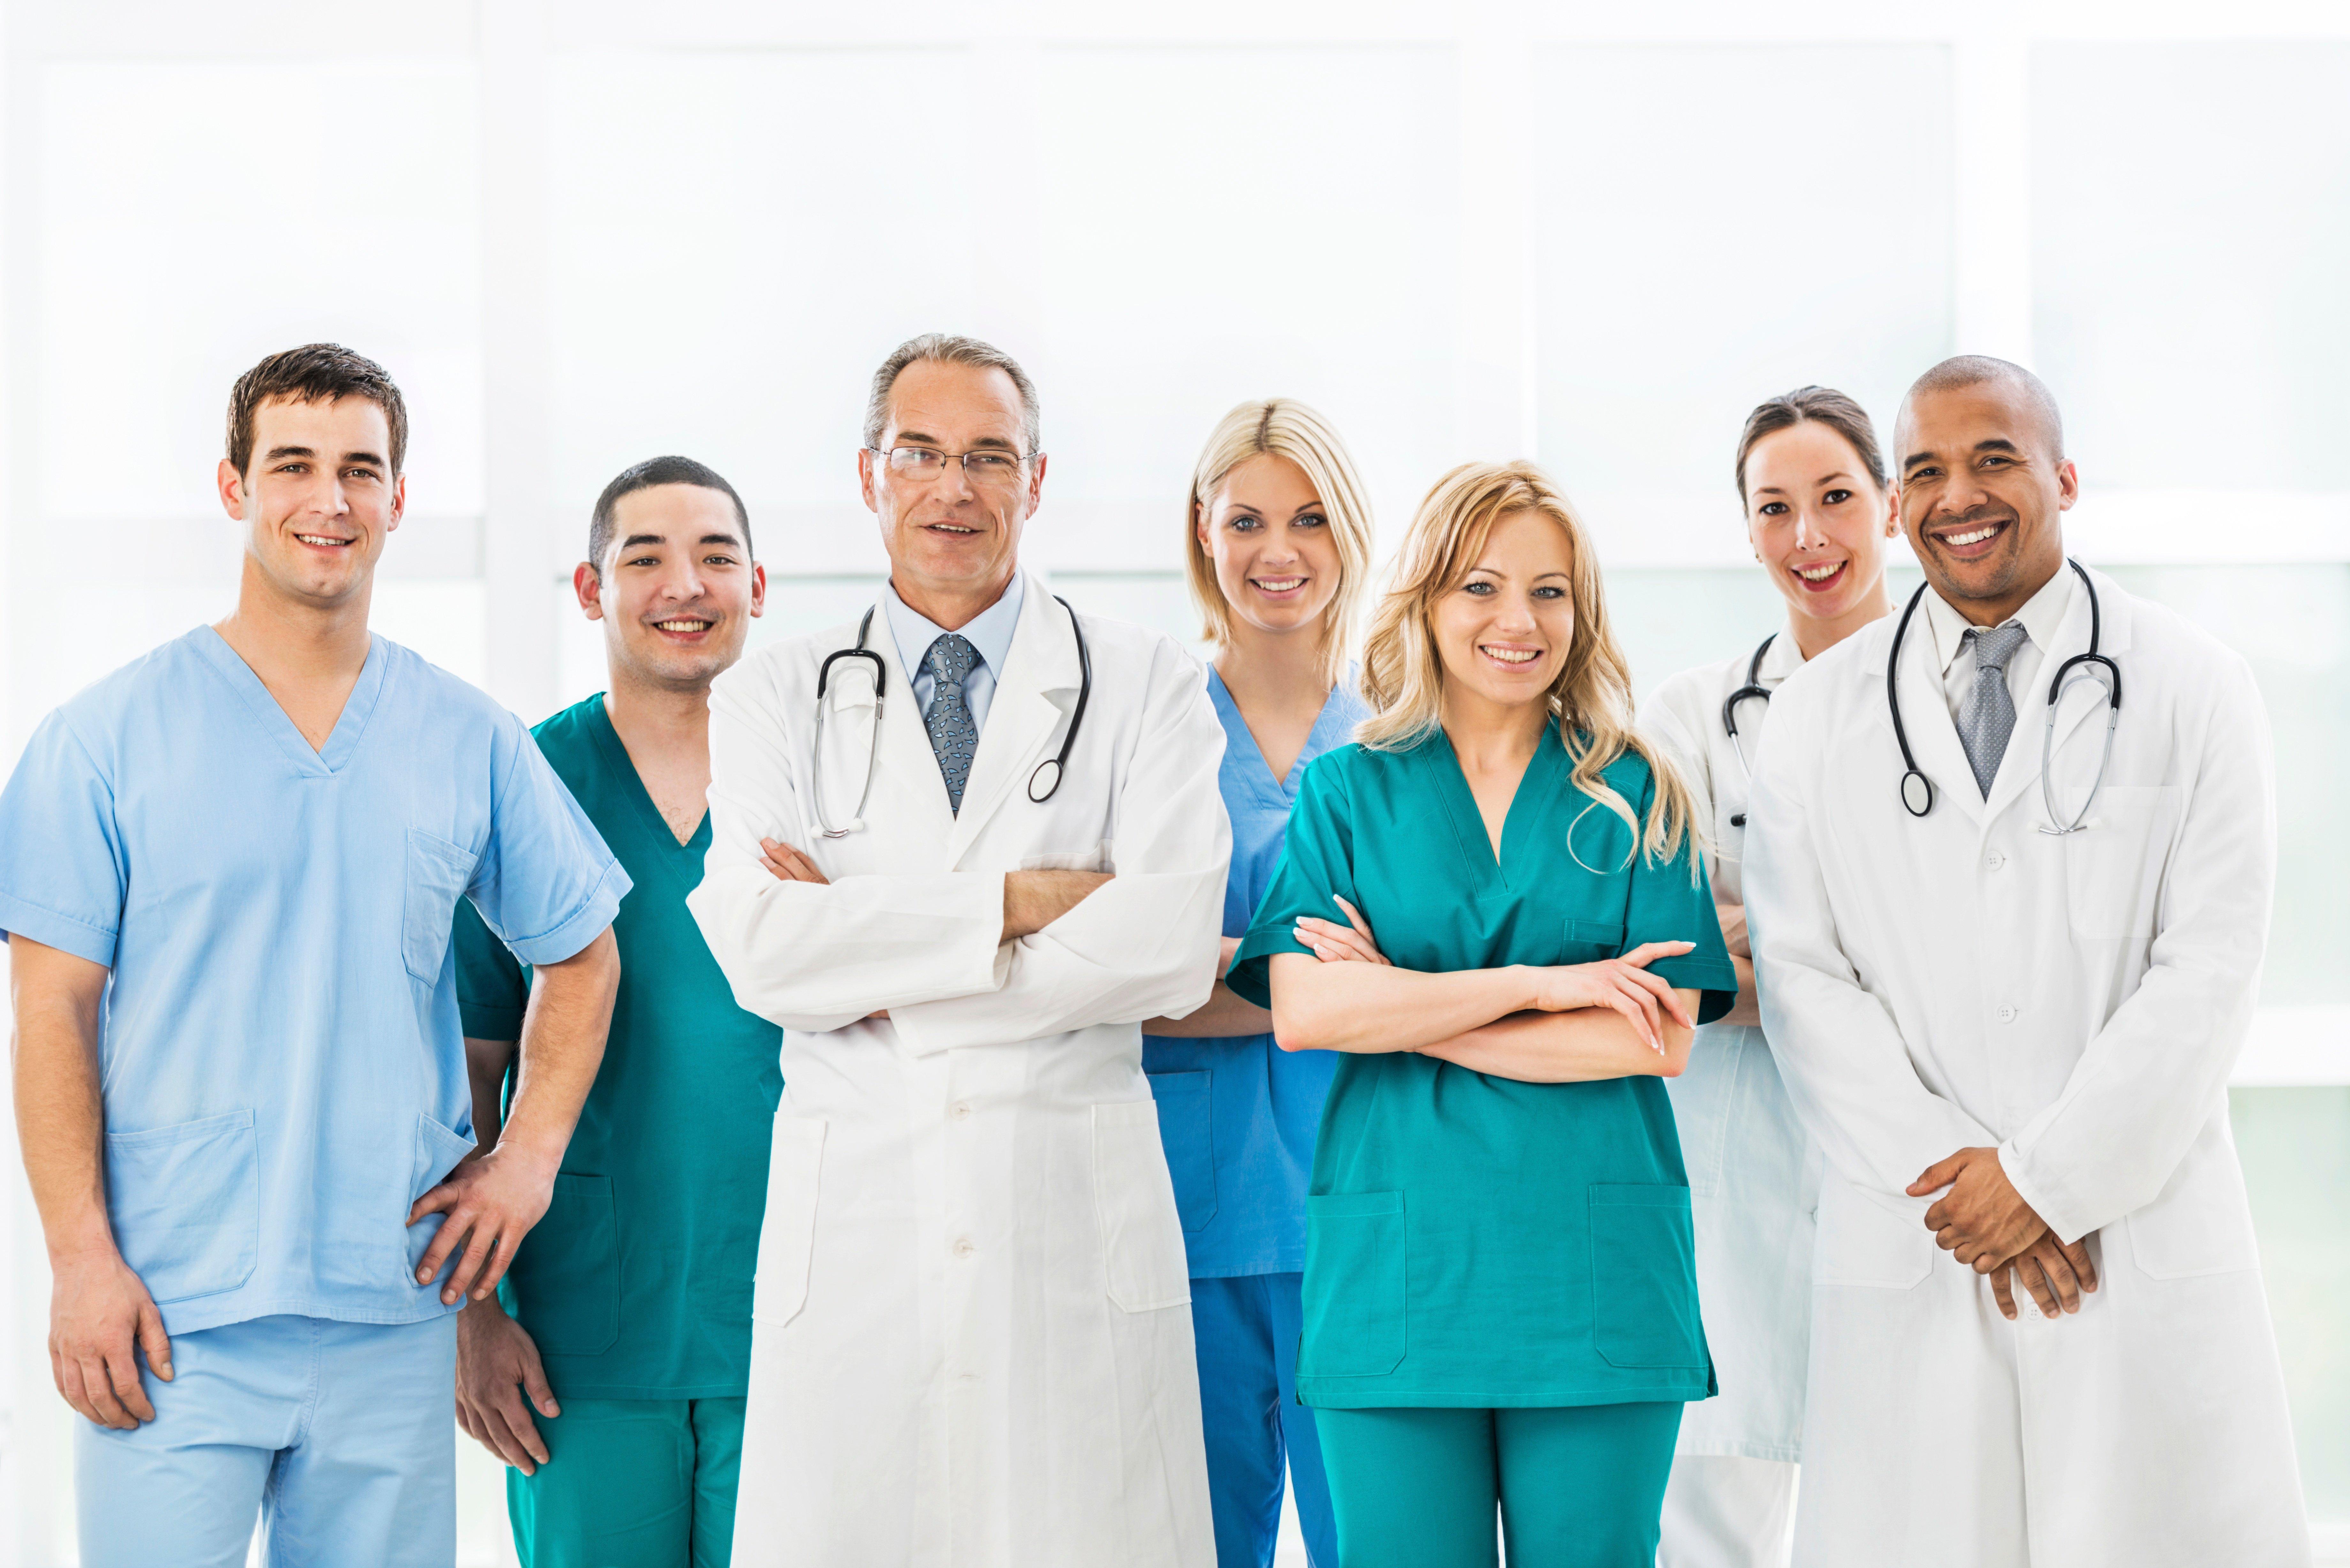 Parallon Workforce Solutions helps St. Luke's University Health Network meet its goals